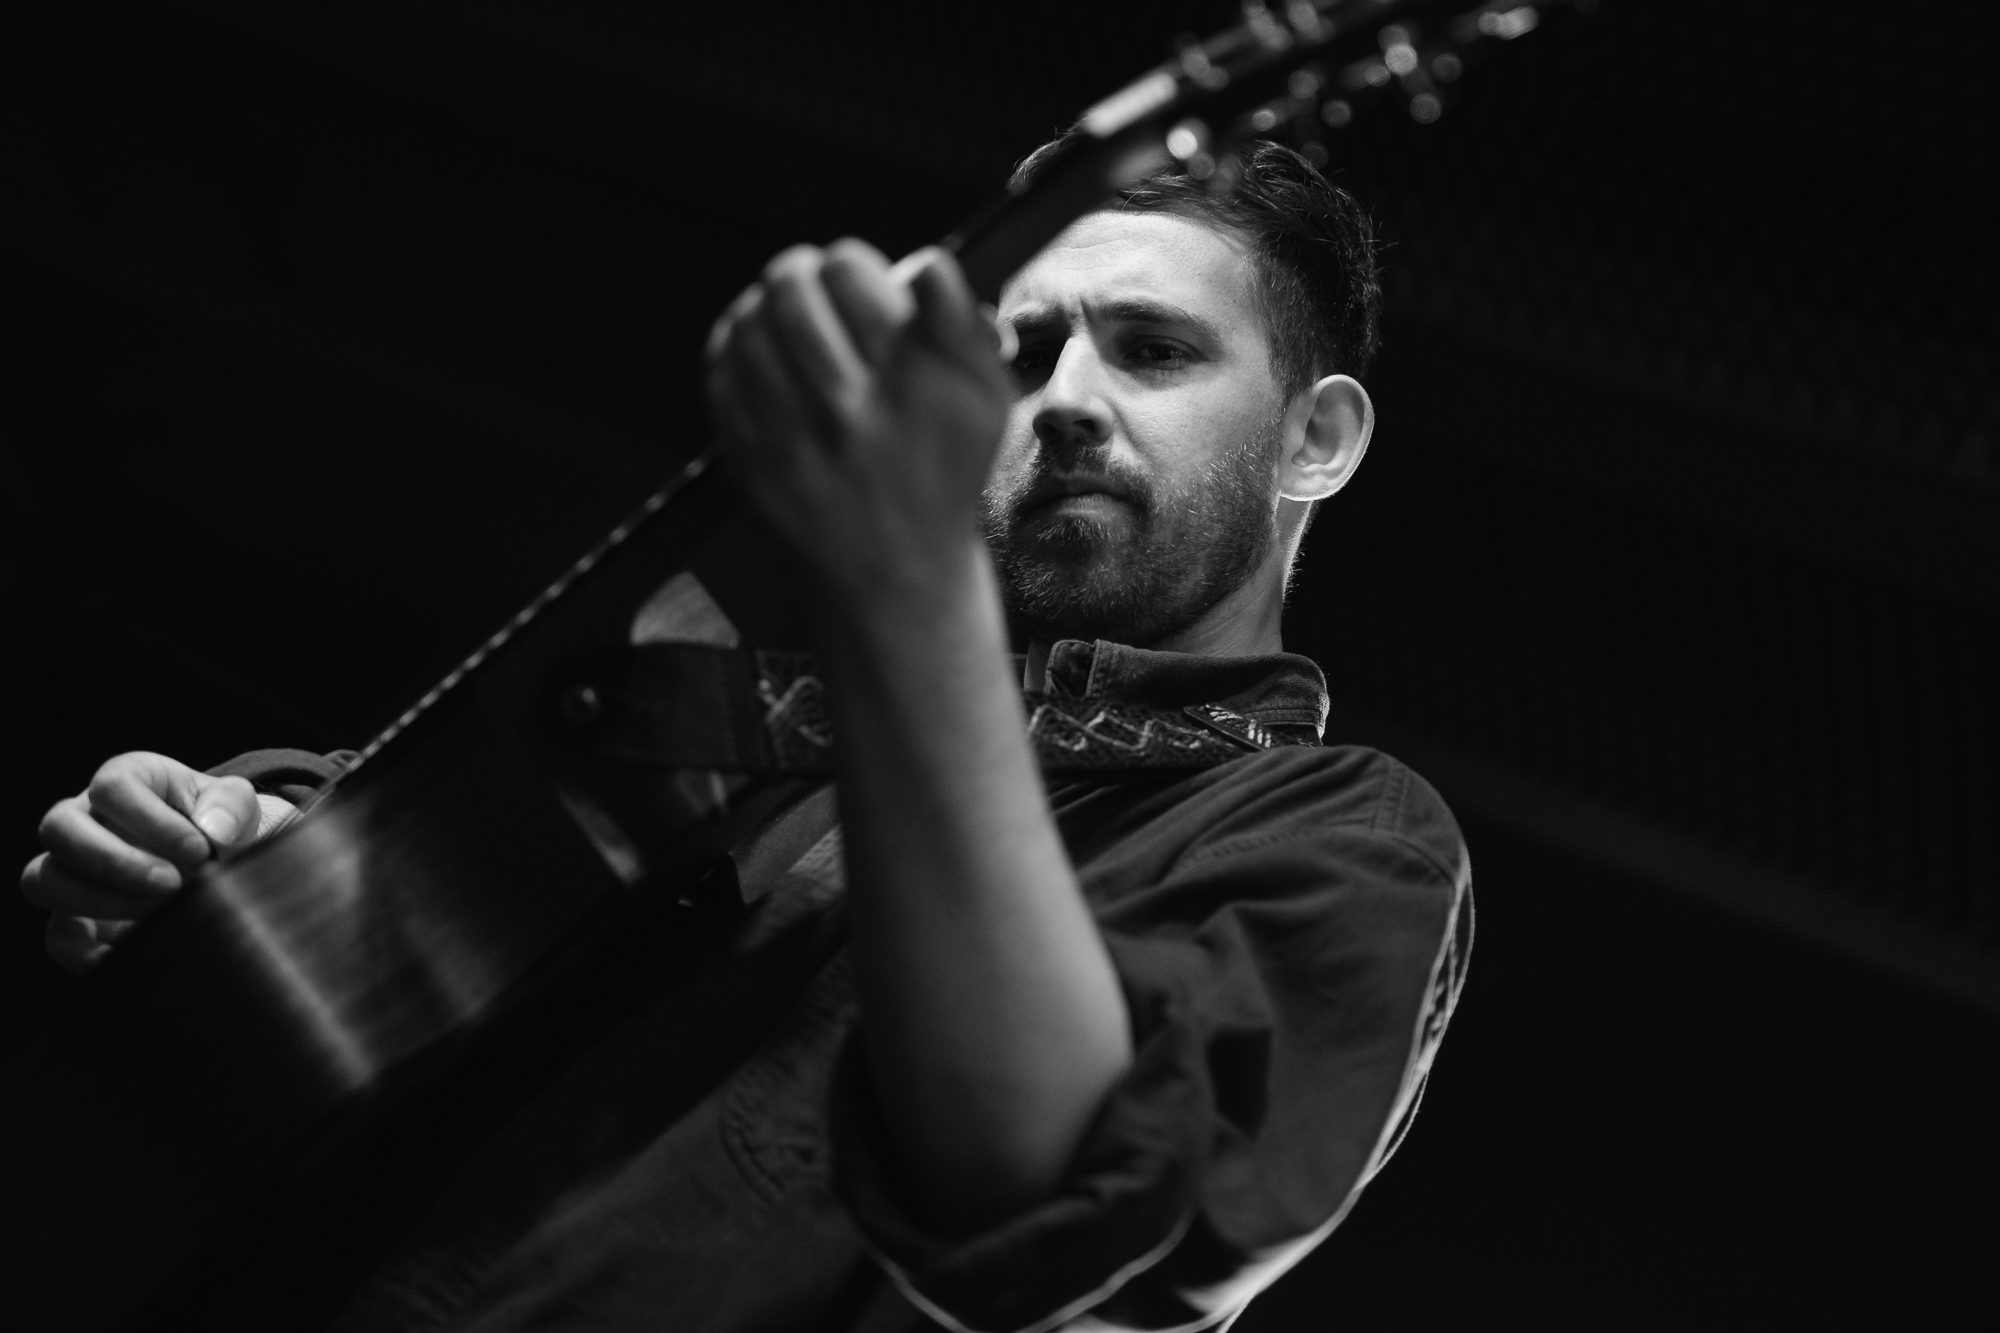 Bridges-band-live-session-20170101-0144-Hanny-Foxhall.jpg